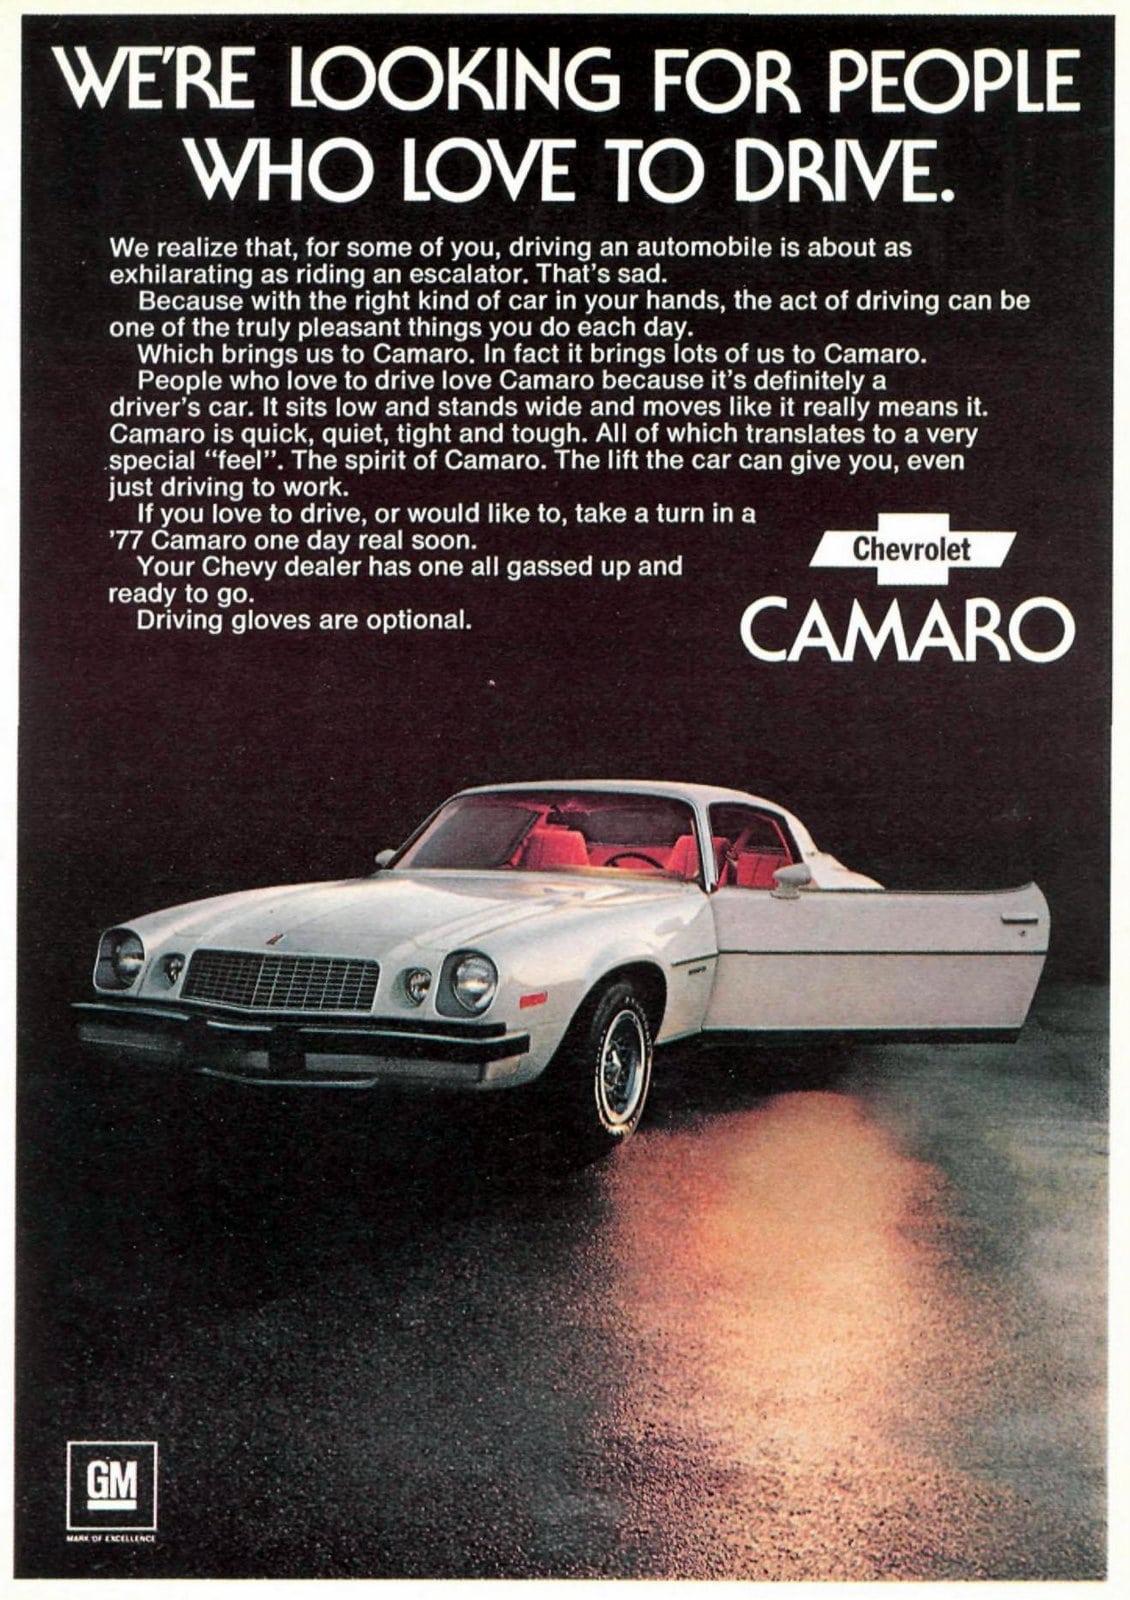 1977 Chevrolet Camaro cars